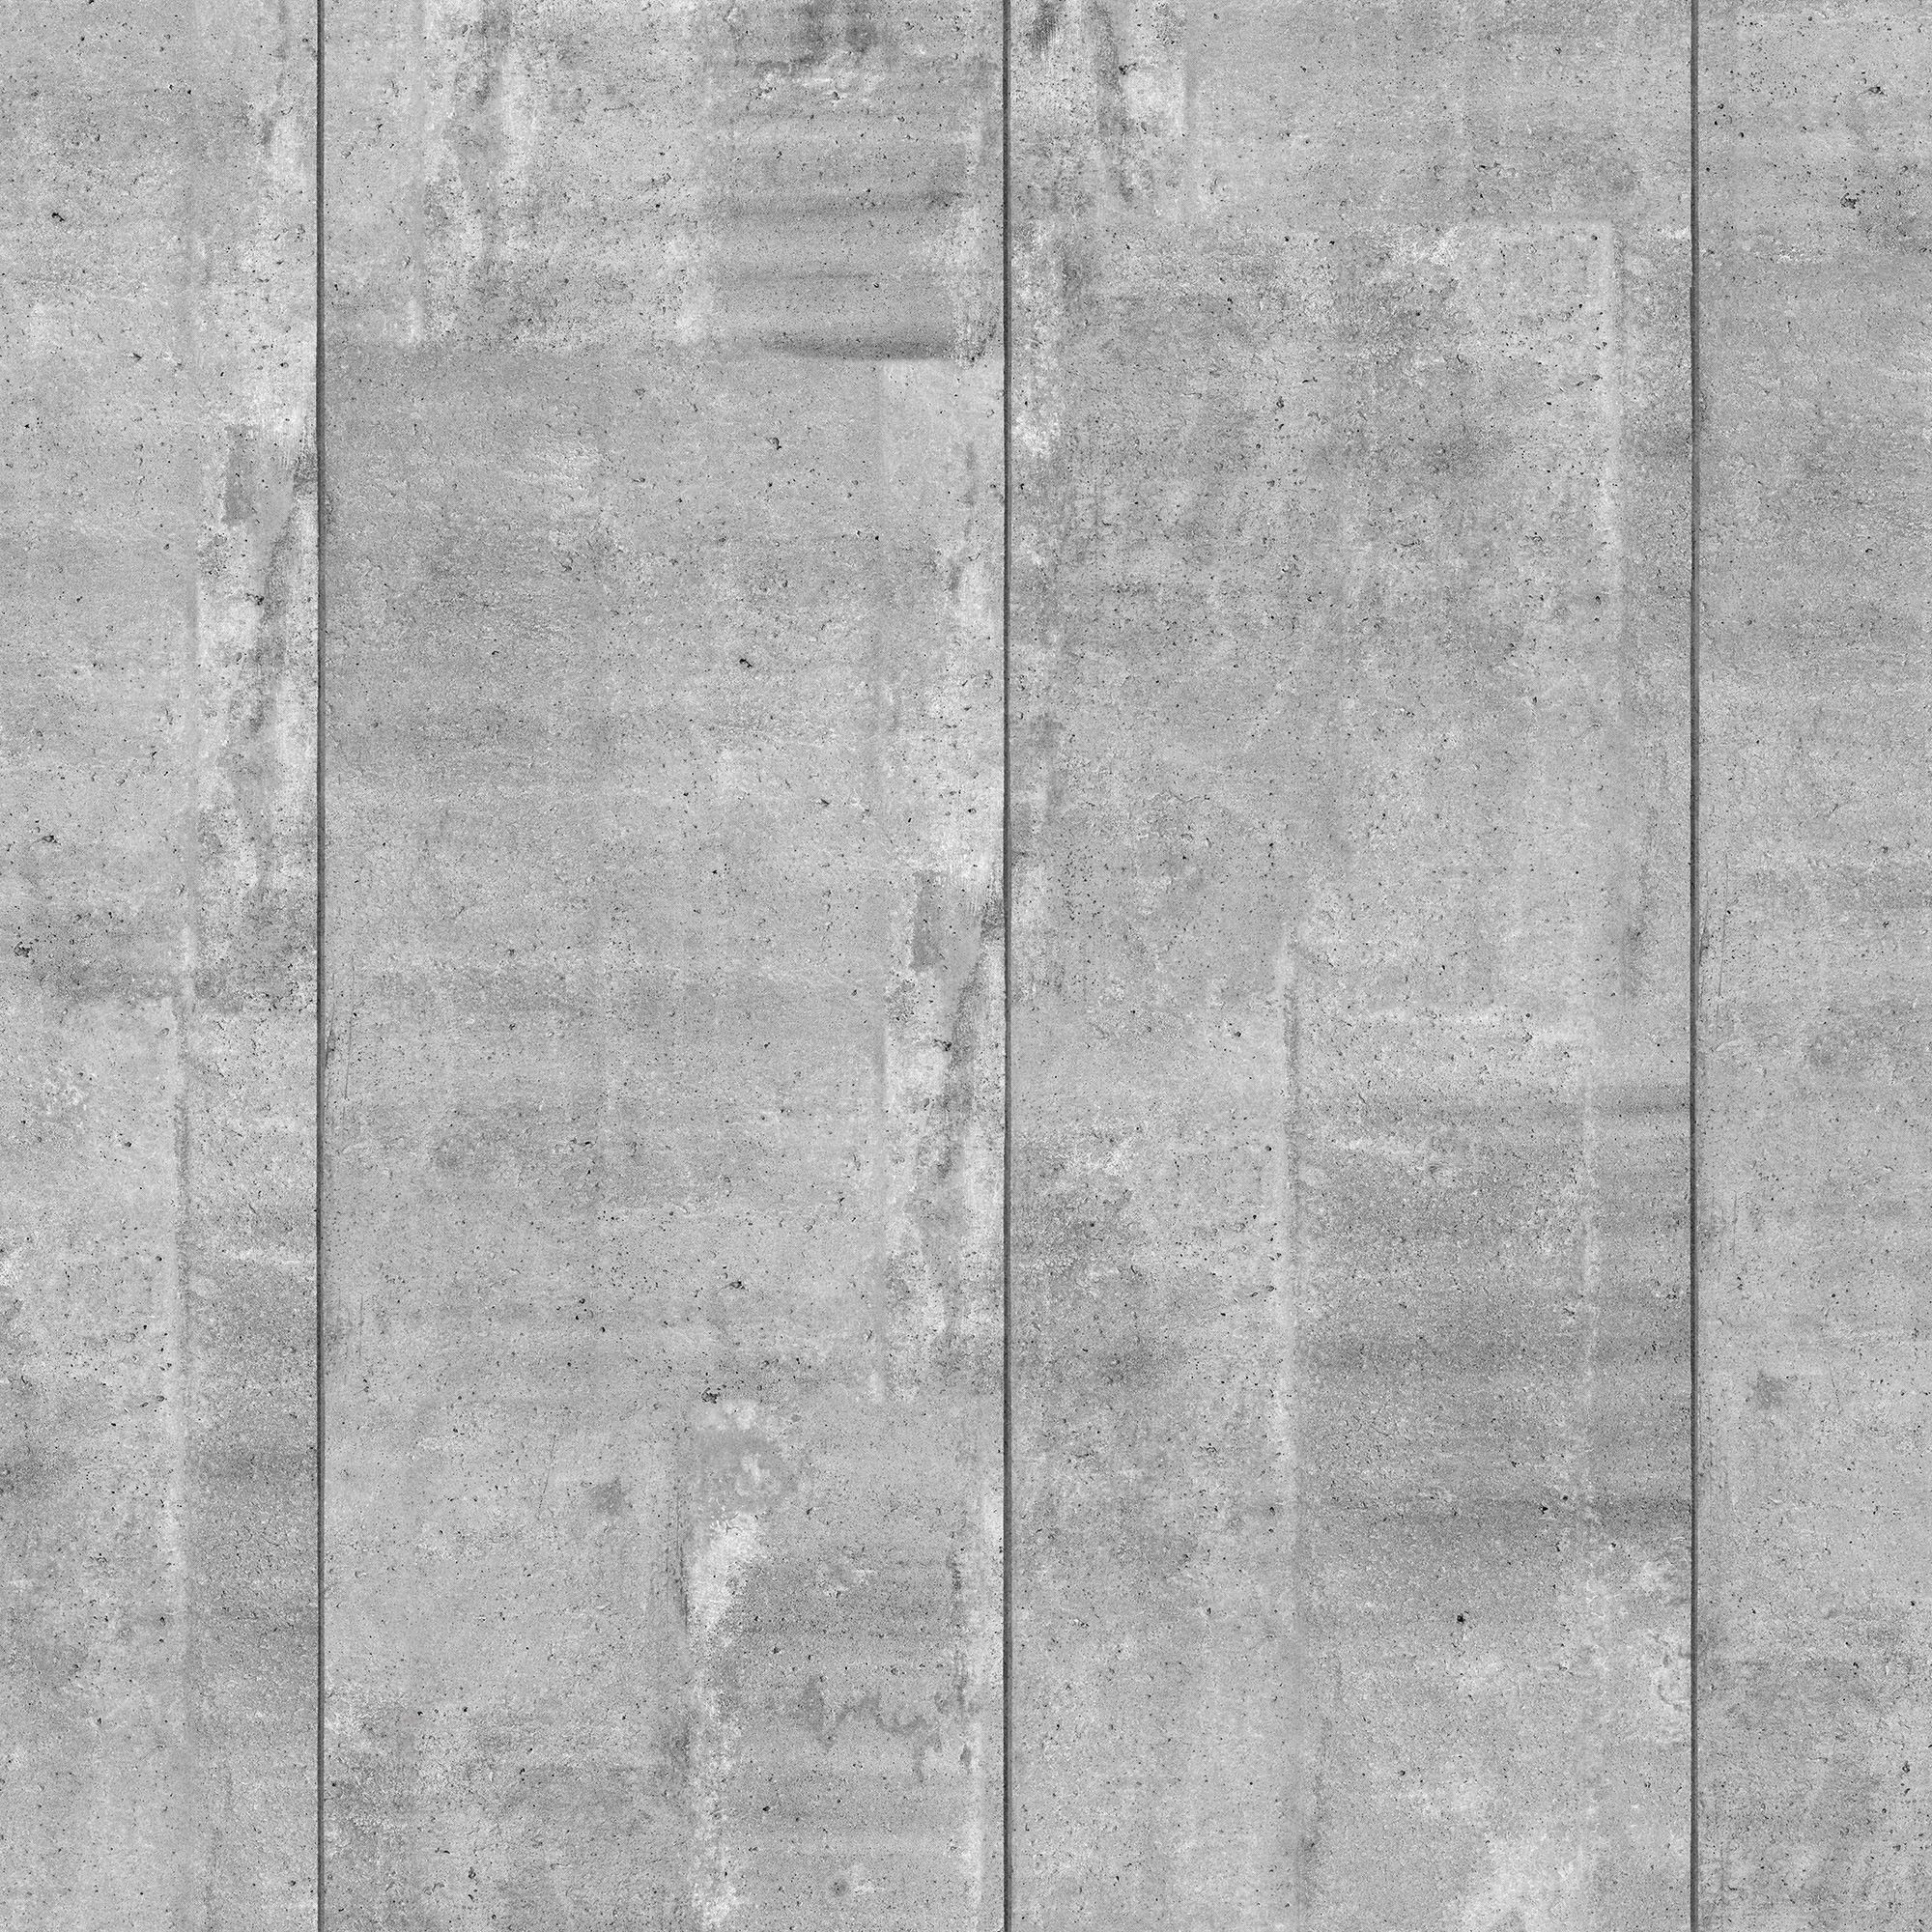 Concrete Smooth Wallpaper Concrete Concrete Wallpaper Commercial Wallpaper